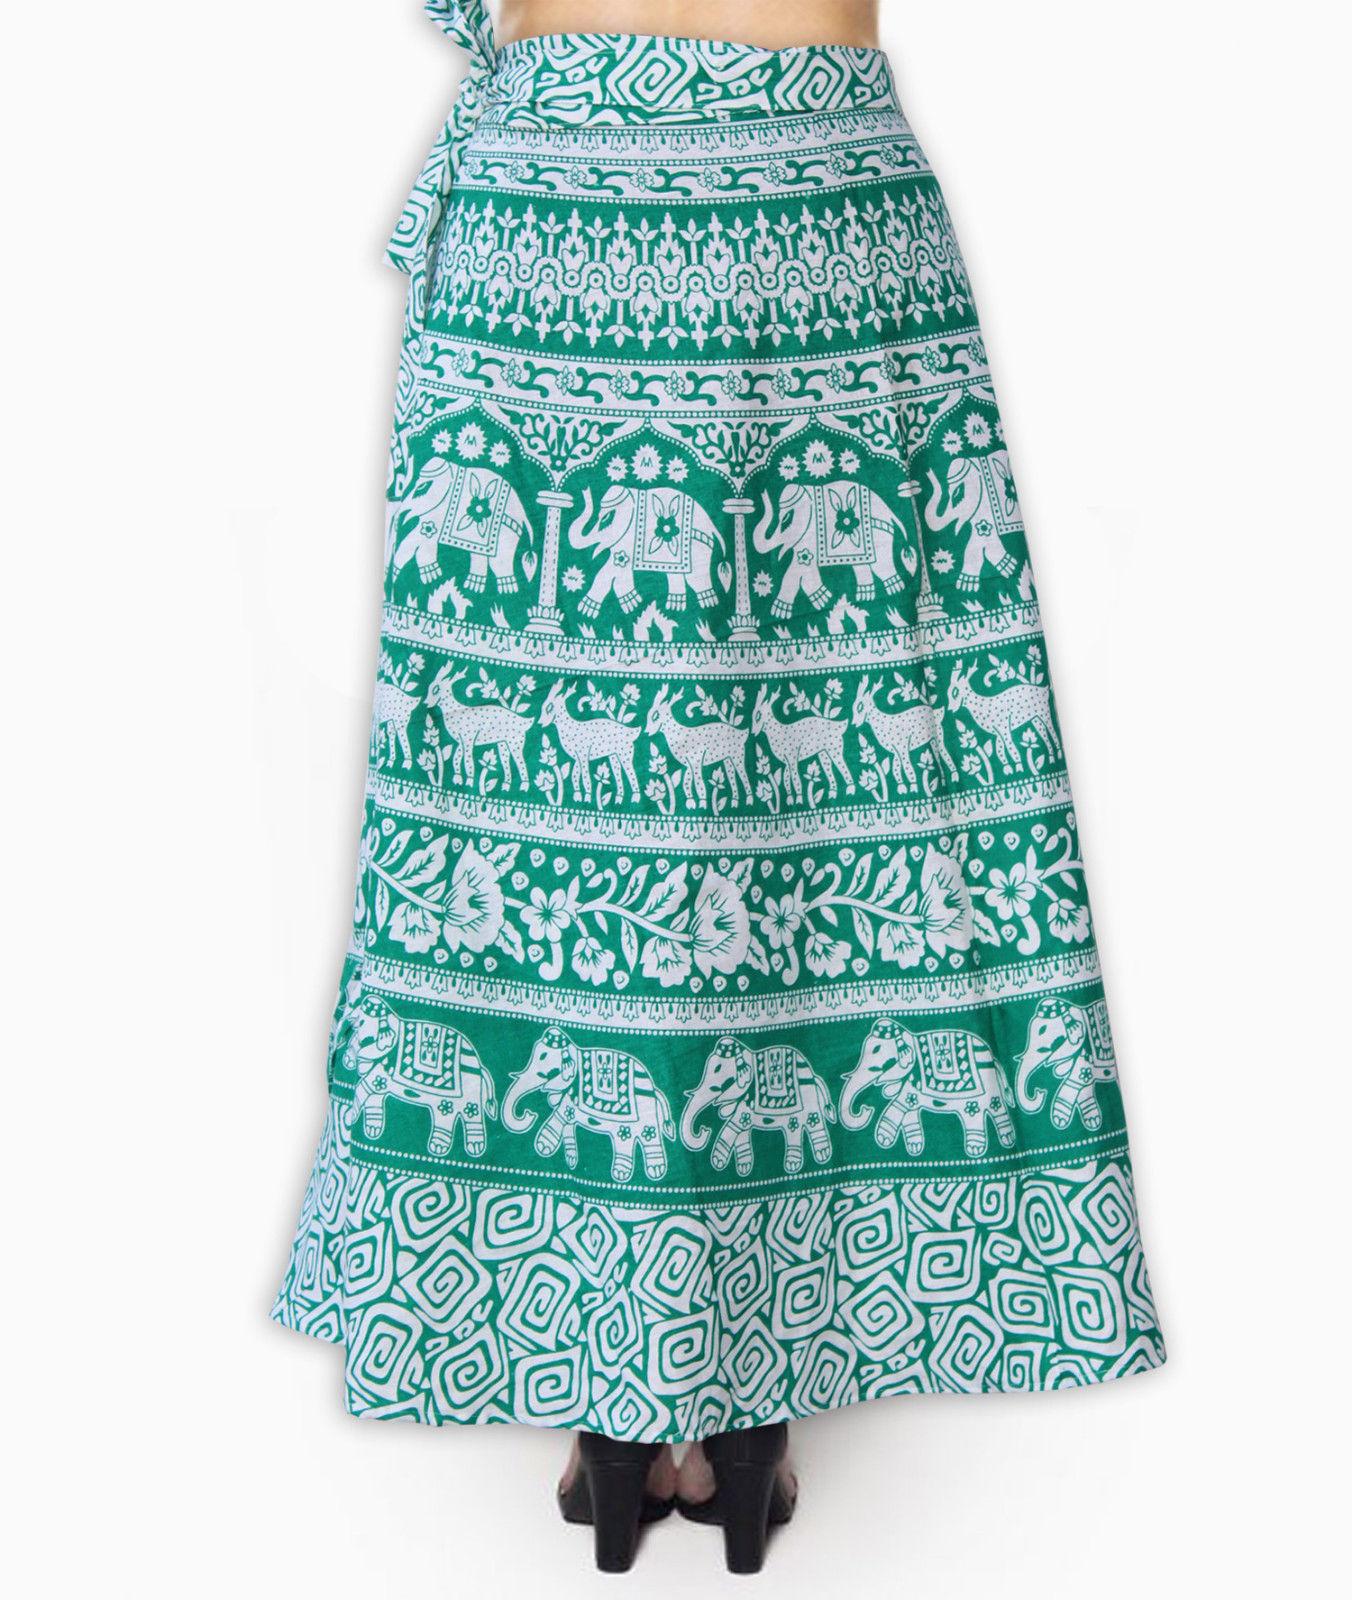 Boho India Elephant Cotton Handmade Printed Wrap Around Long Skirt